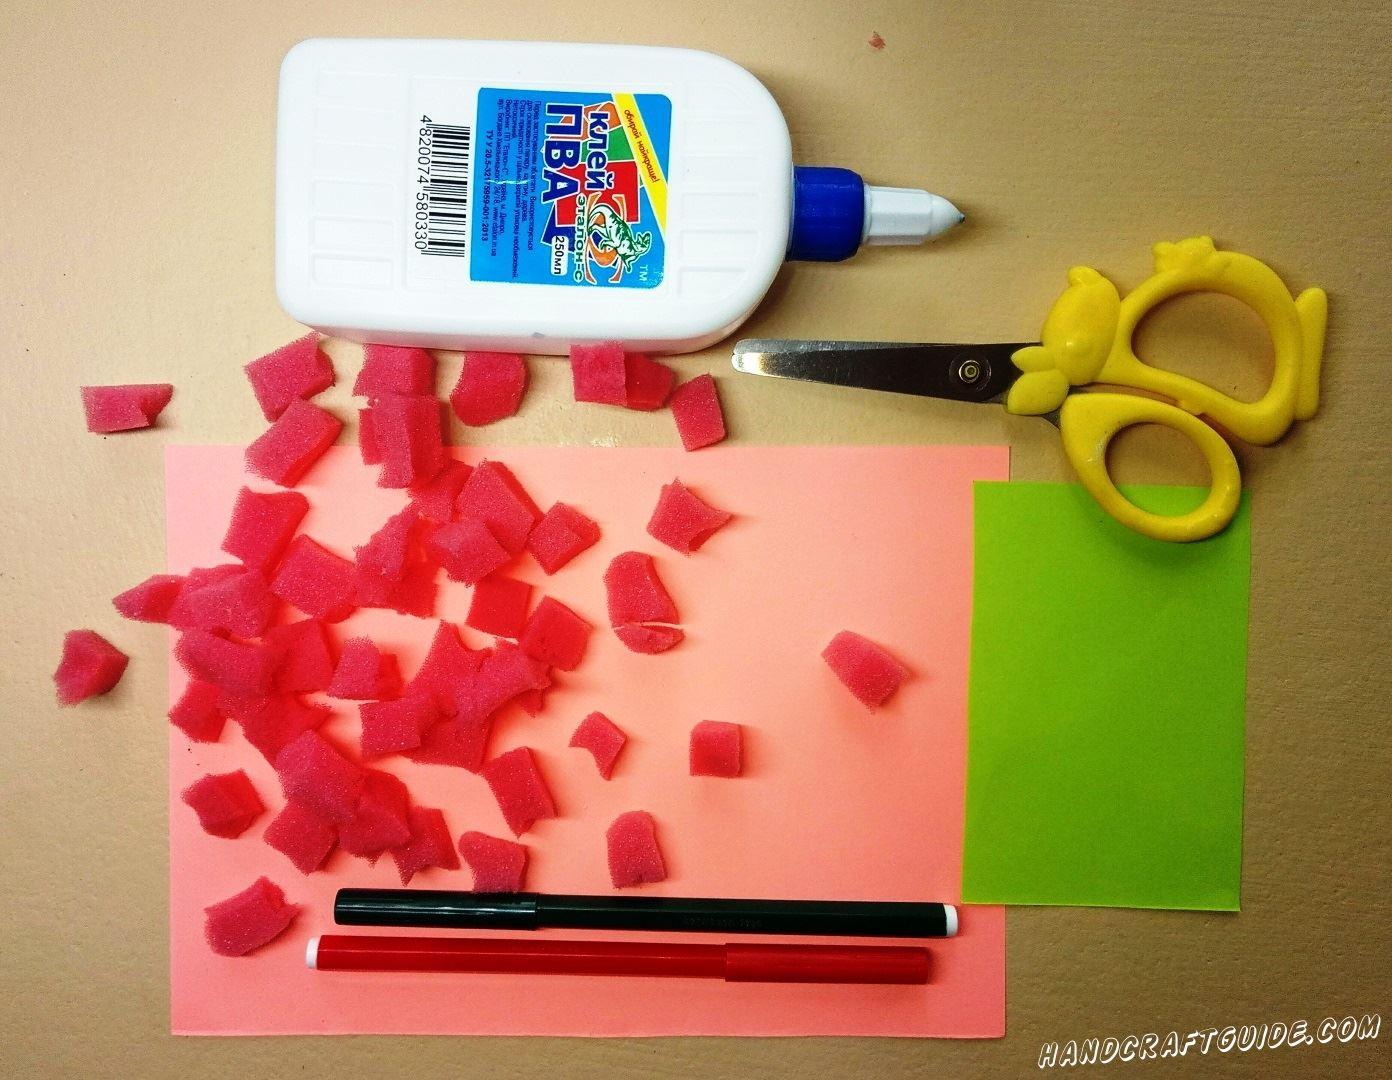 Красную мягкую губку разрезаем на мелкие кусочки